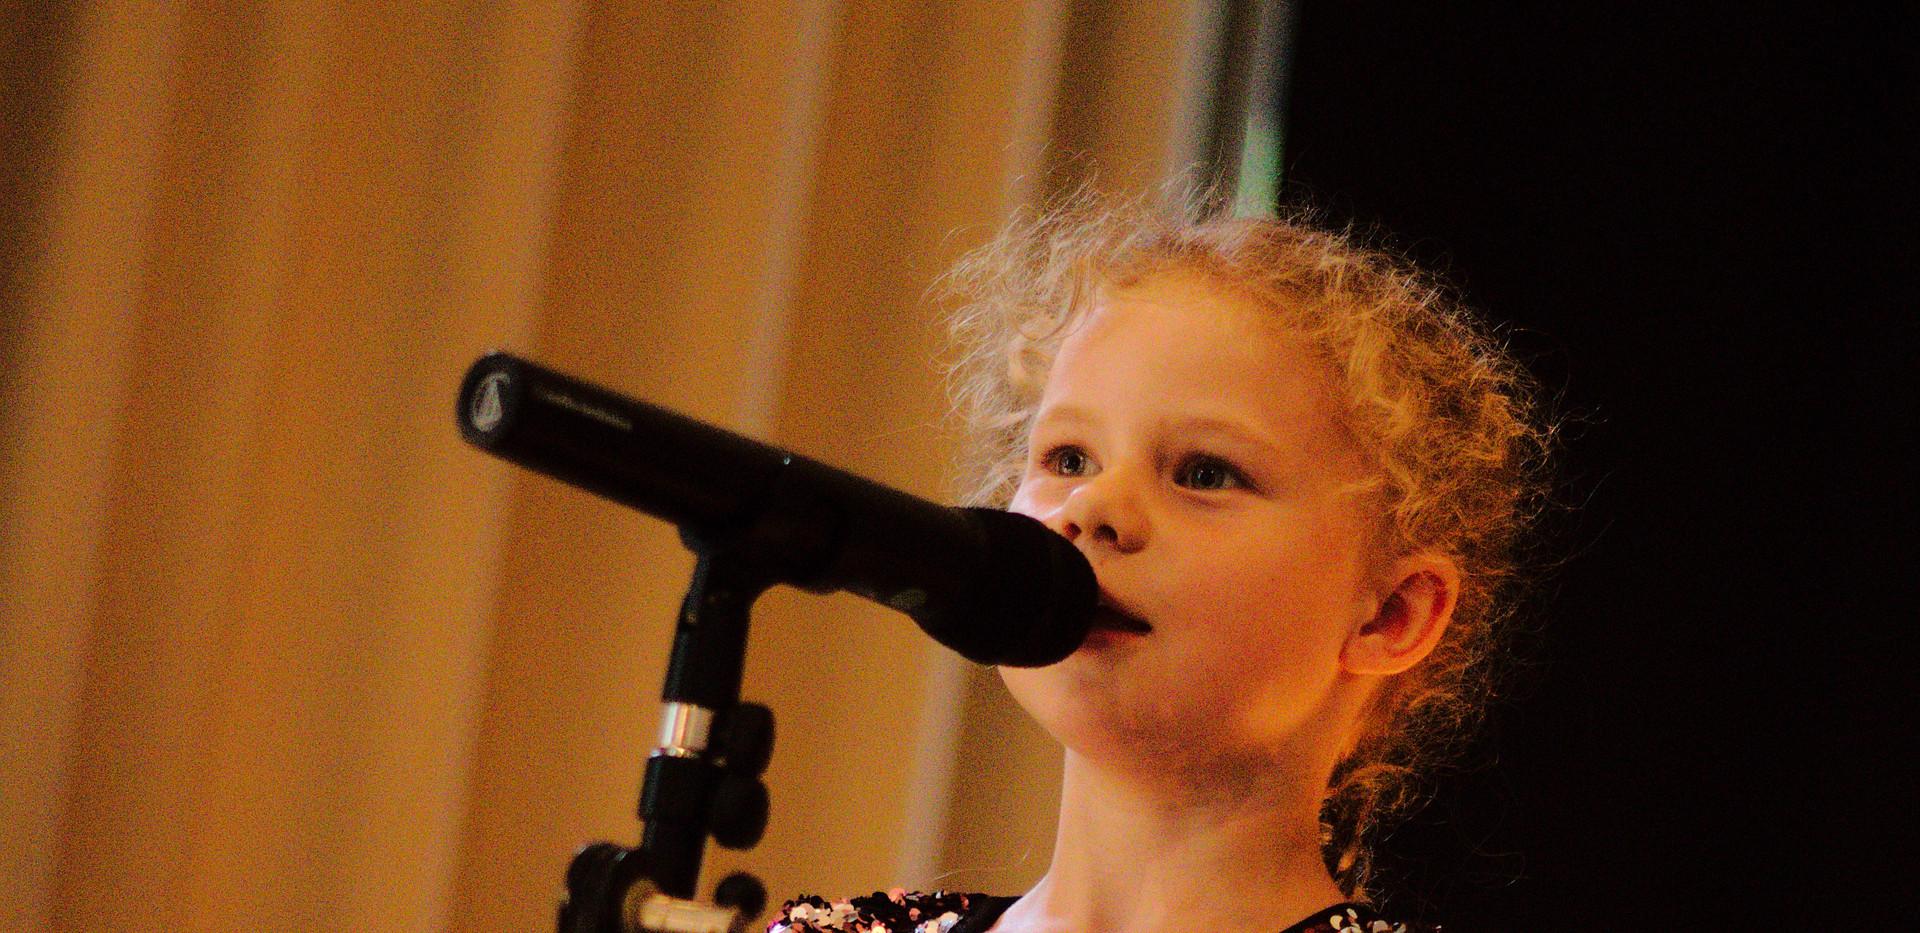 Lisa-Maria @ Enjoy your Voice Sommerkonzert